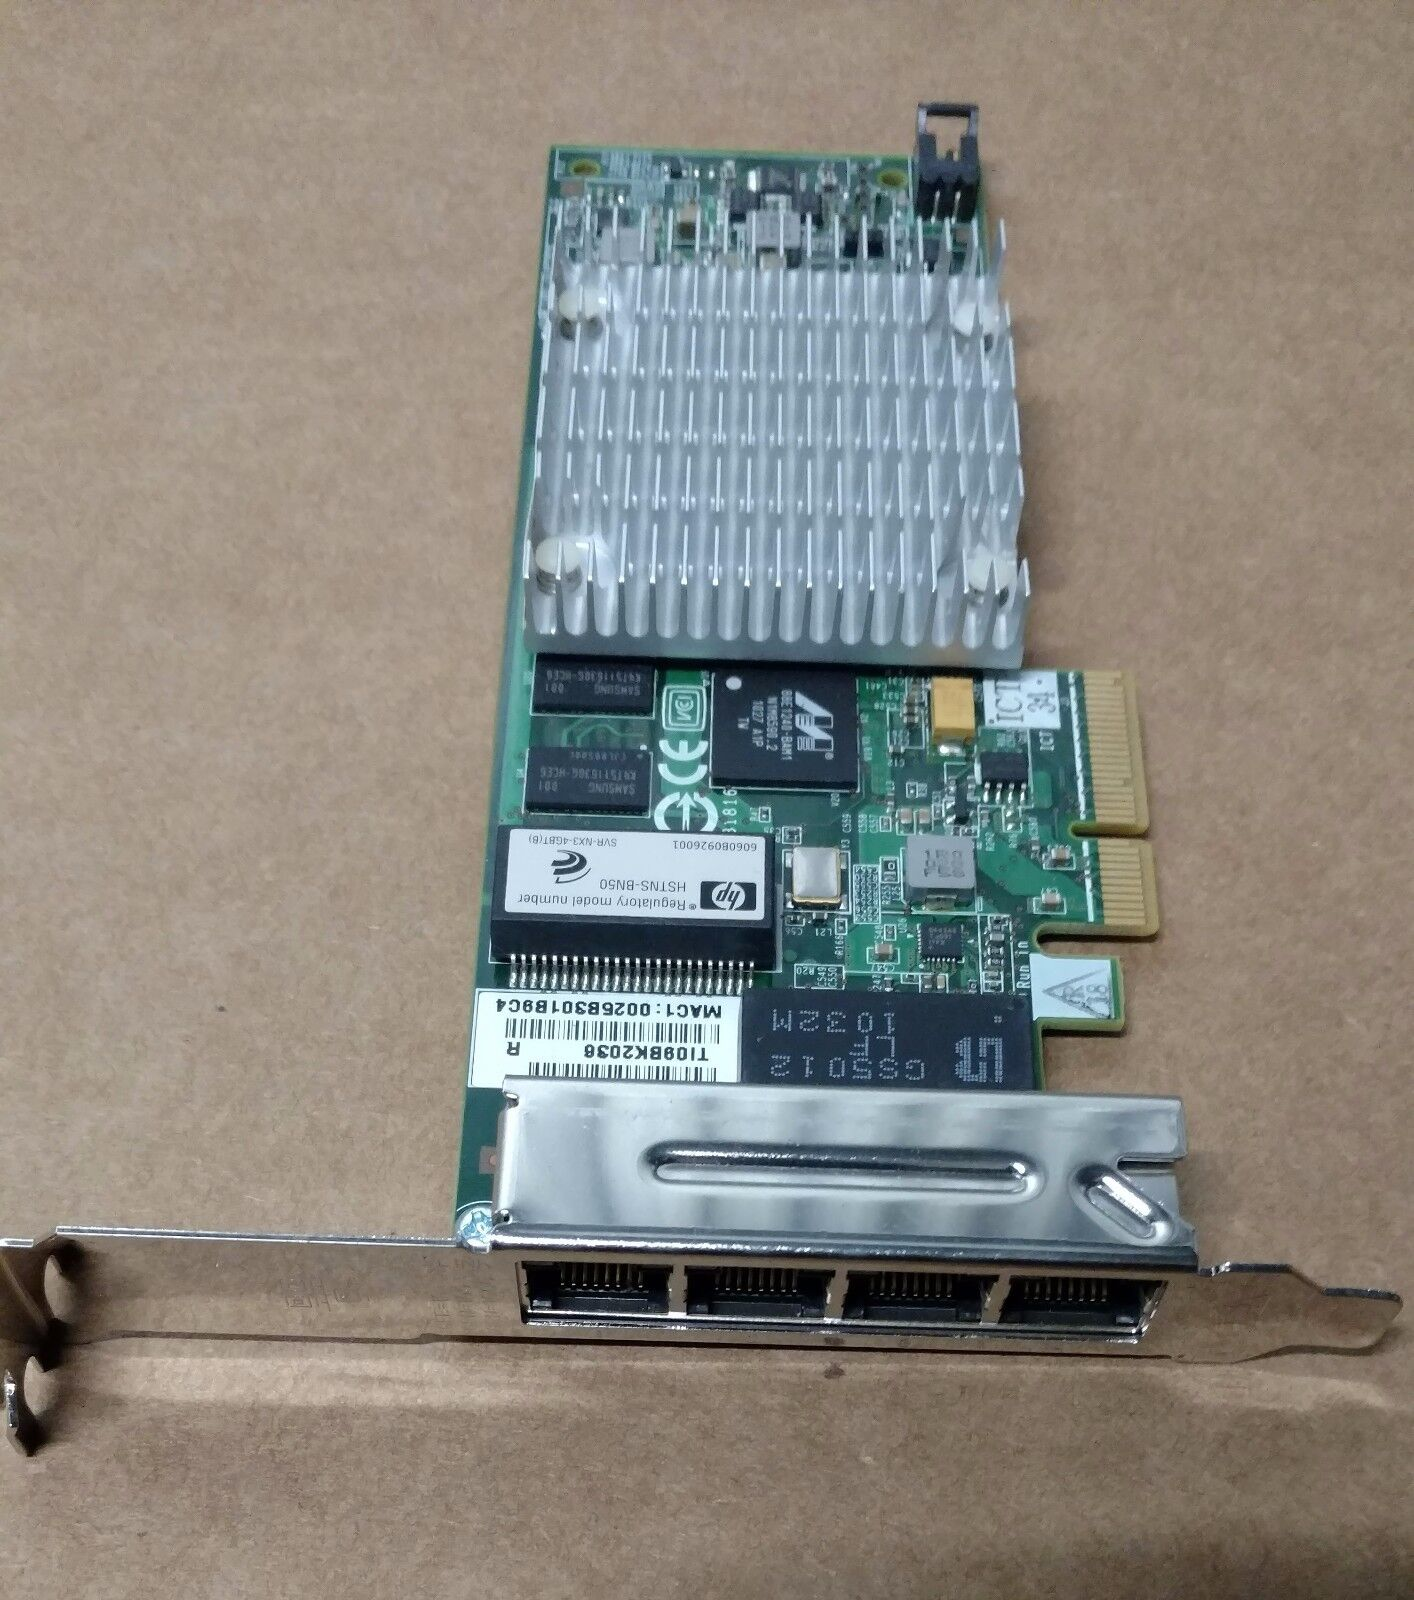 539931-001 491176-001: HP NC375T 4-port Gigabit Ethernet adapter